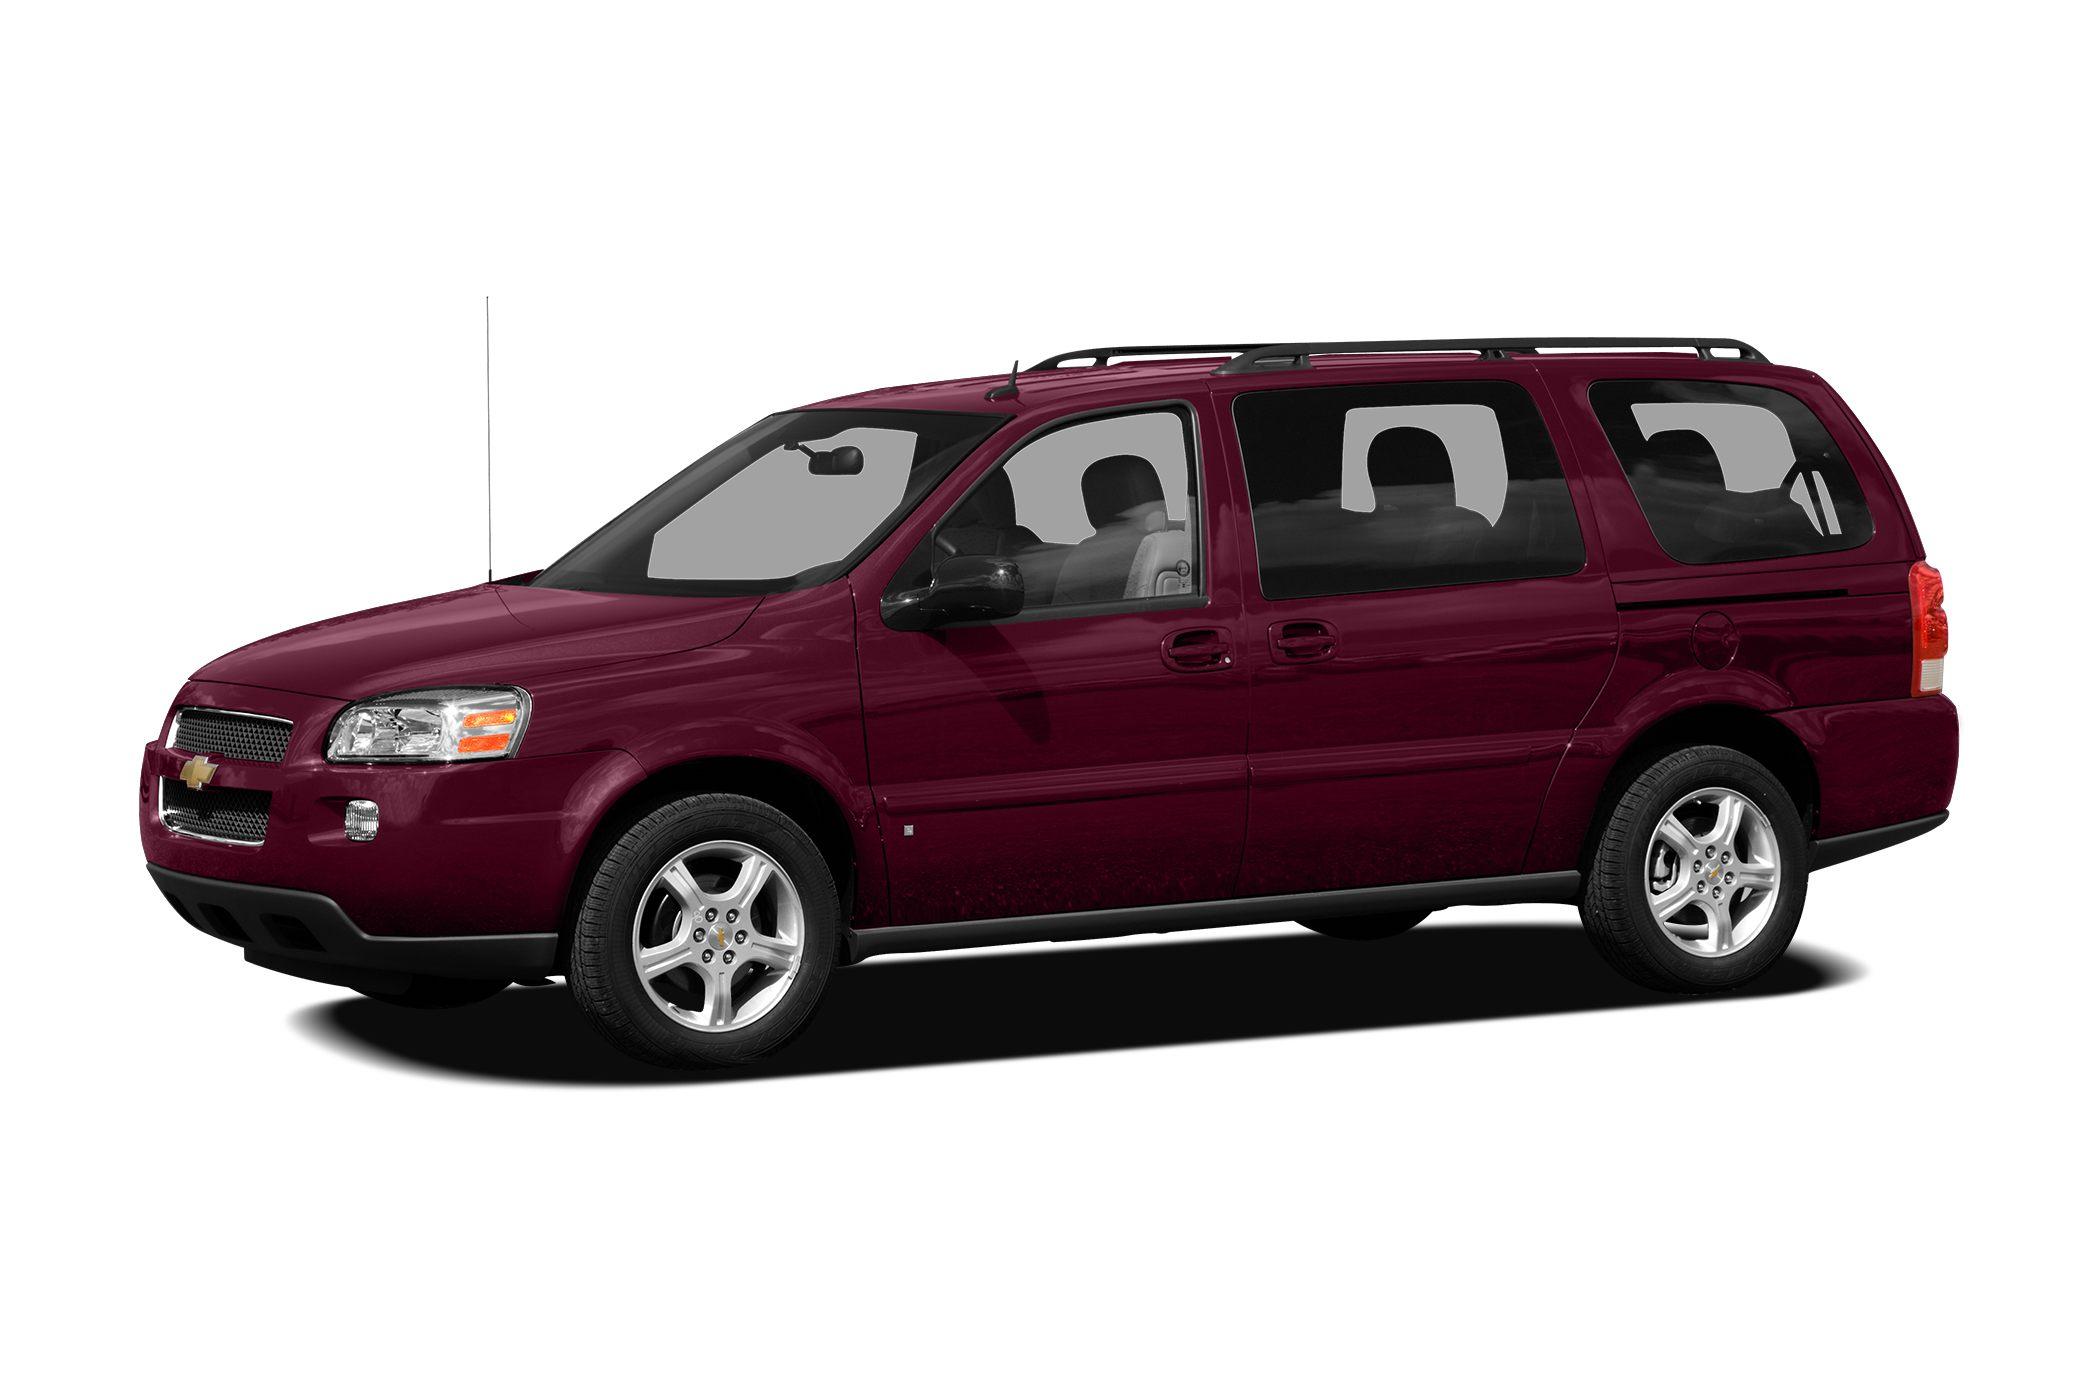 2006 Chevrolet Uplander LT ENTERTAINMENT SYSTEM MP3 Player CHILD LOCKS 3RD ROW SEAT KEYLESS EN